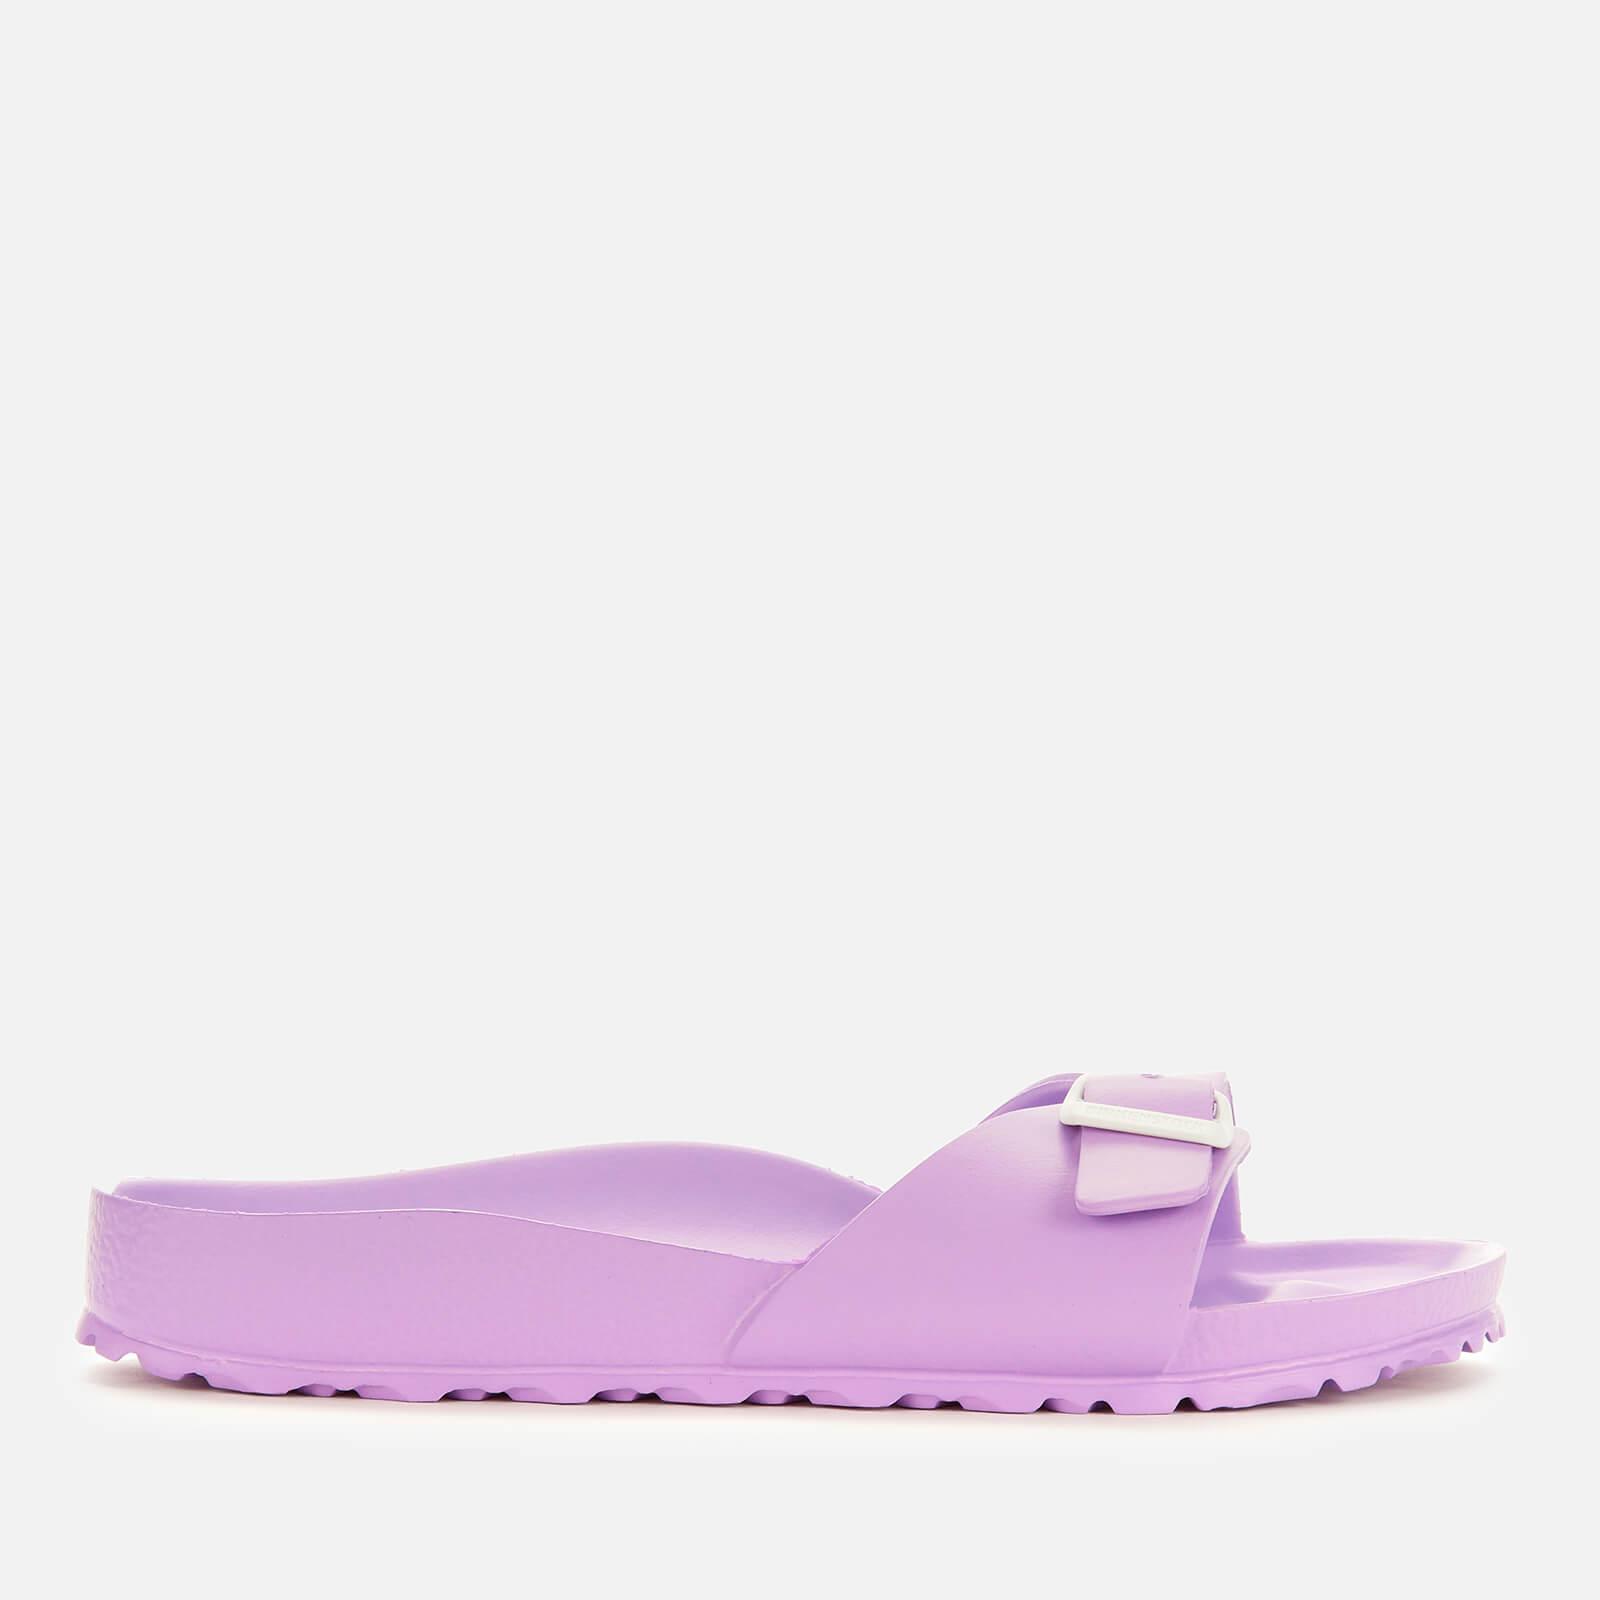 707e086c5 Birkenstock Women's Madrid EVA Single Strap Sandals - Lavender | FREE UK  Delivery | Allsole